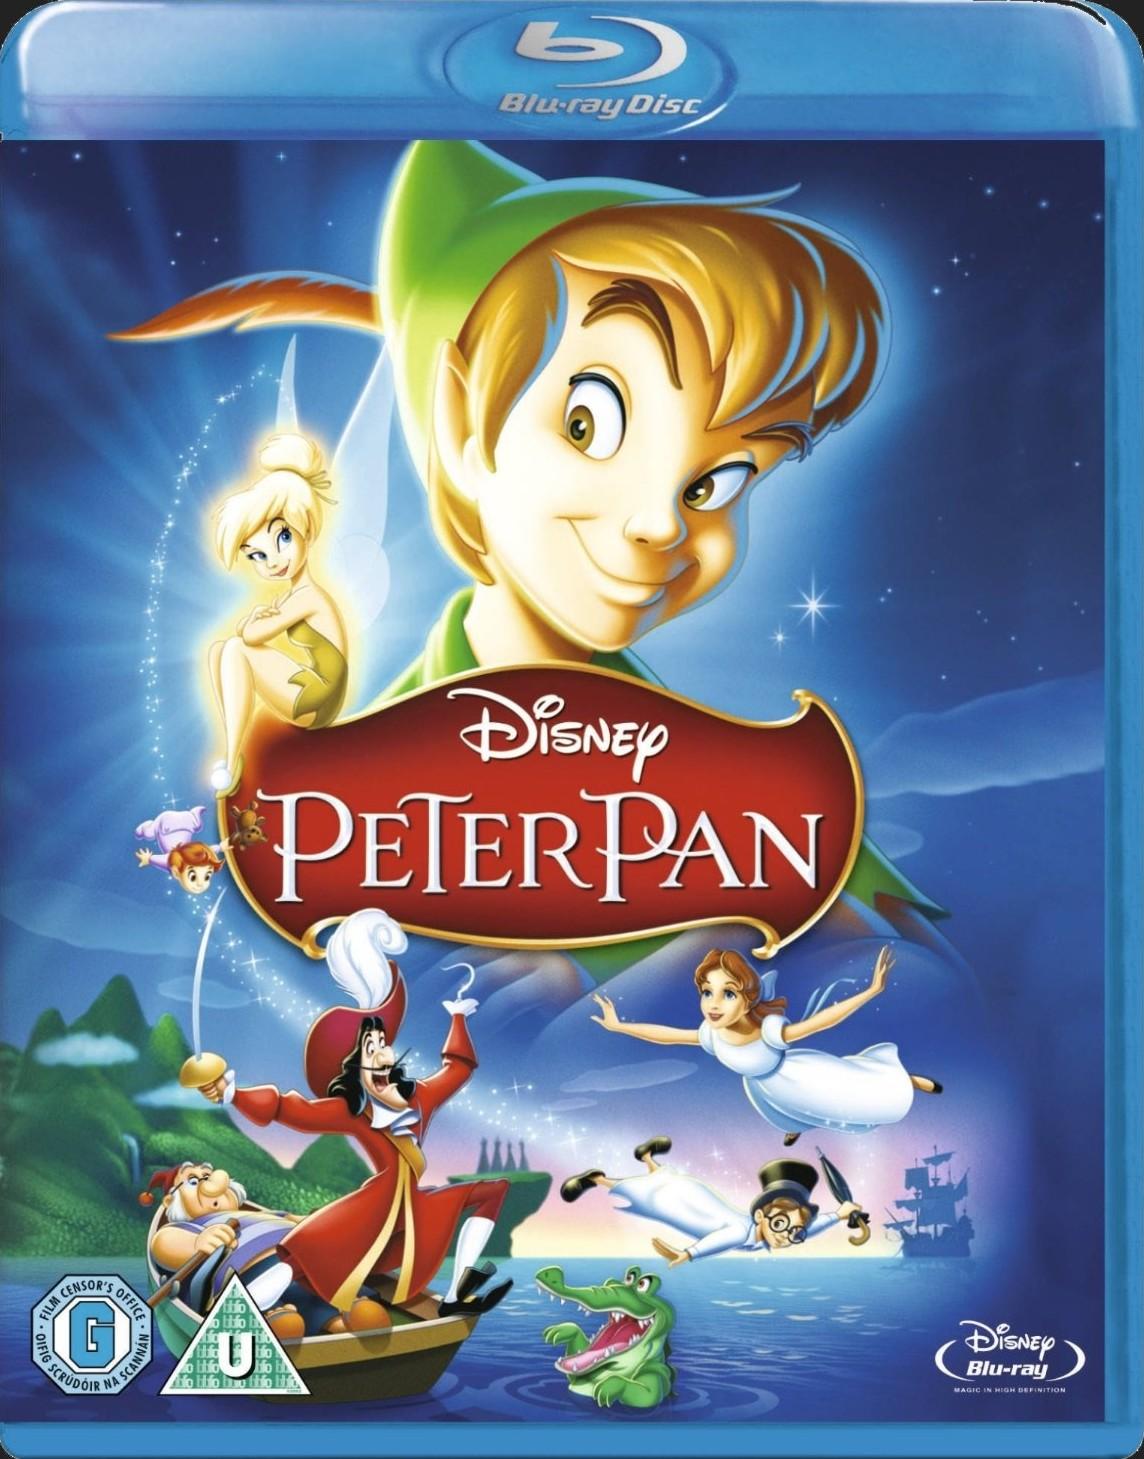 PETR PAN (speciální edice, Disney) - Blu-ray